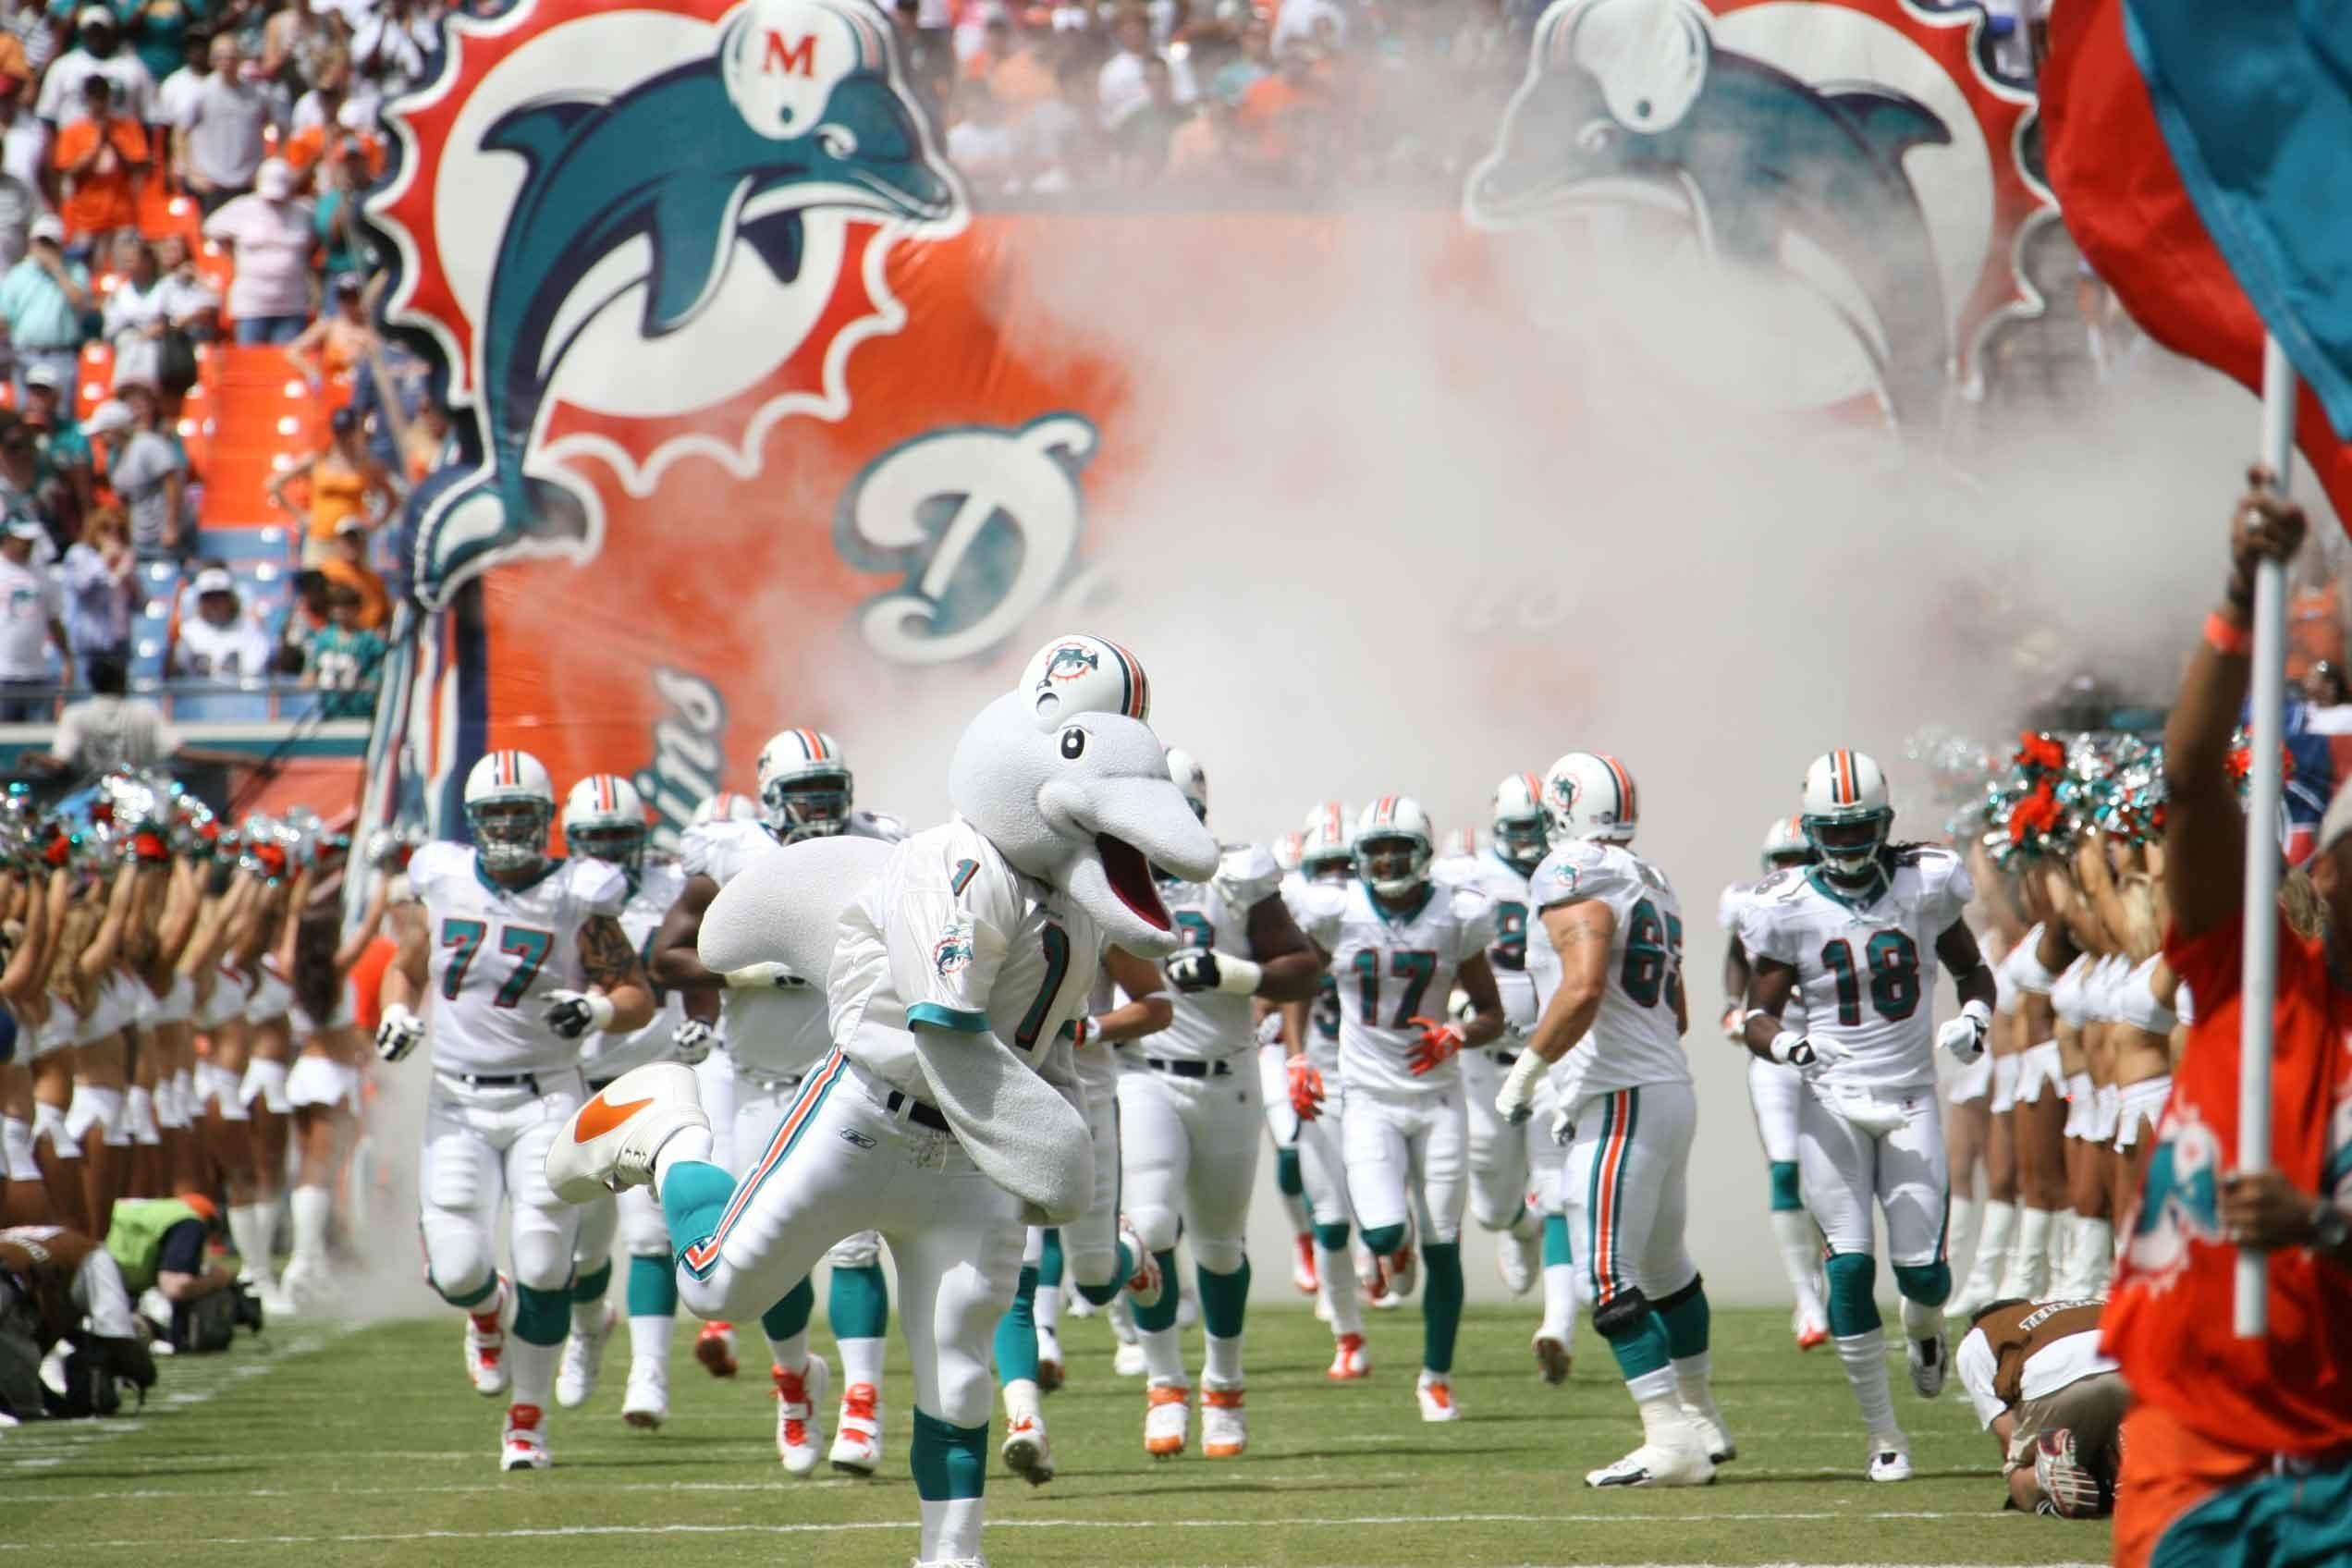 Miami Dolphins Football Season Kicks Off September 13Th with Miami Dolphins Super Bowl Years